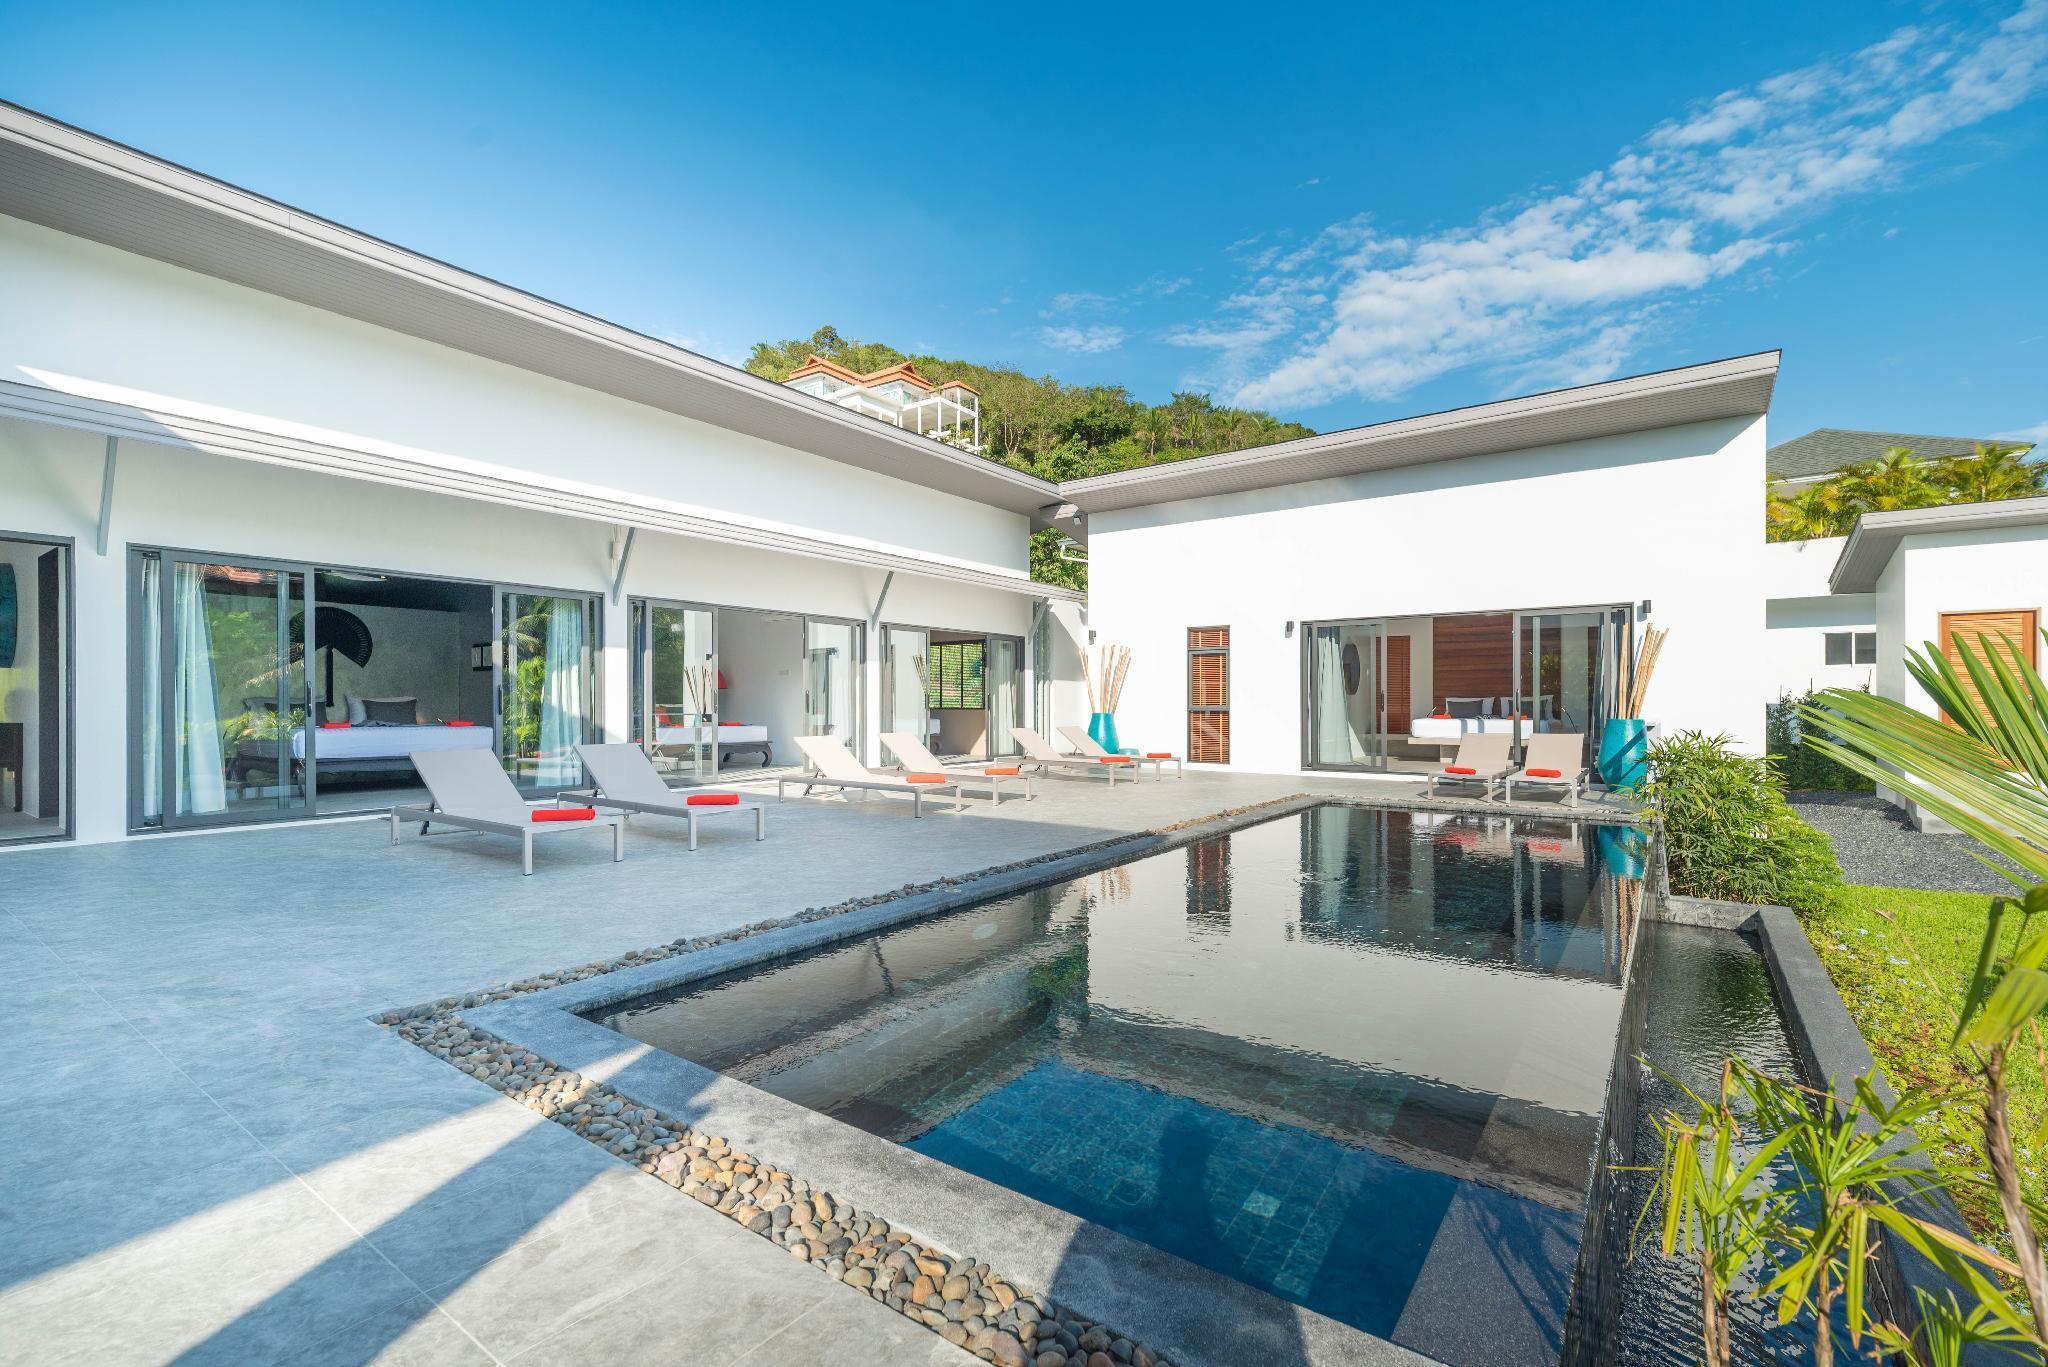 Villa Sai Baho 4BR - Private Pool & Walk to Beach วิลลา 4 ห้องนอน 4 ห้องน้ำส่วนตัว ขนาด 200 ตร.ม. – บางปอ